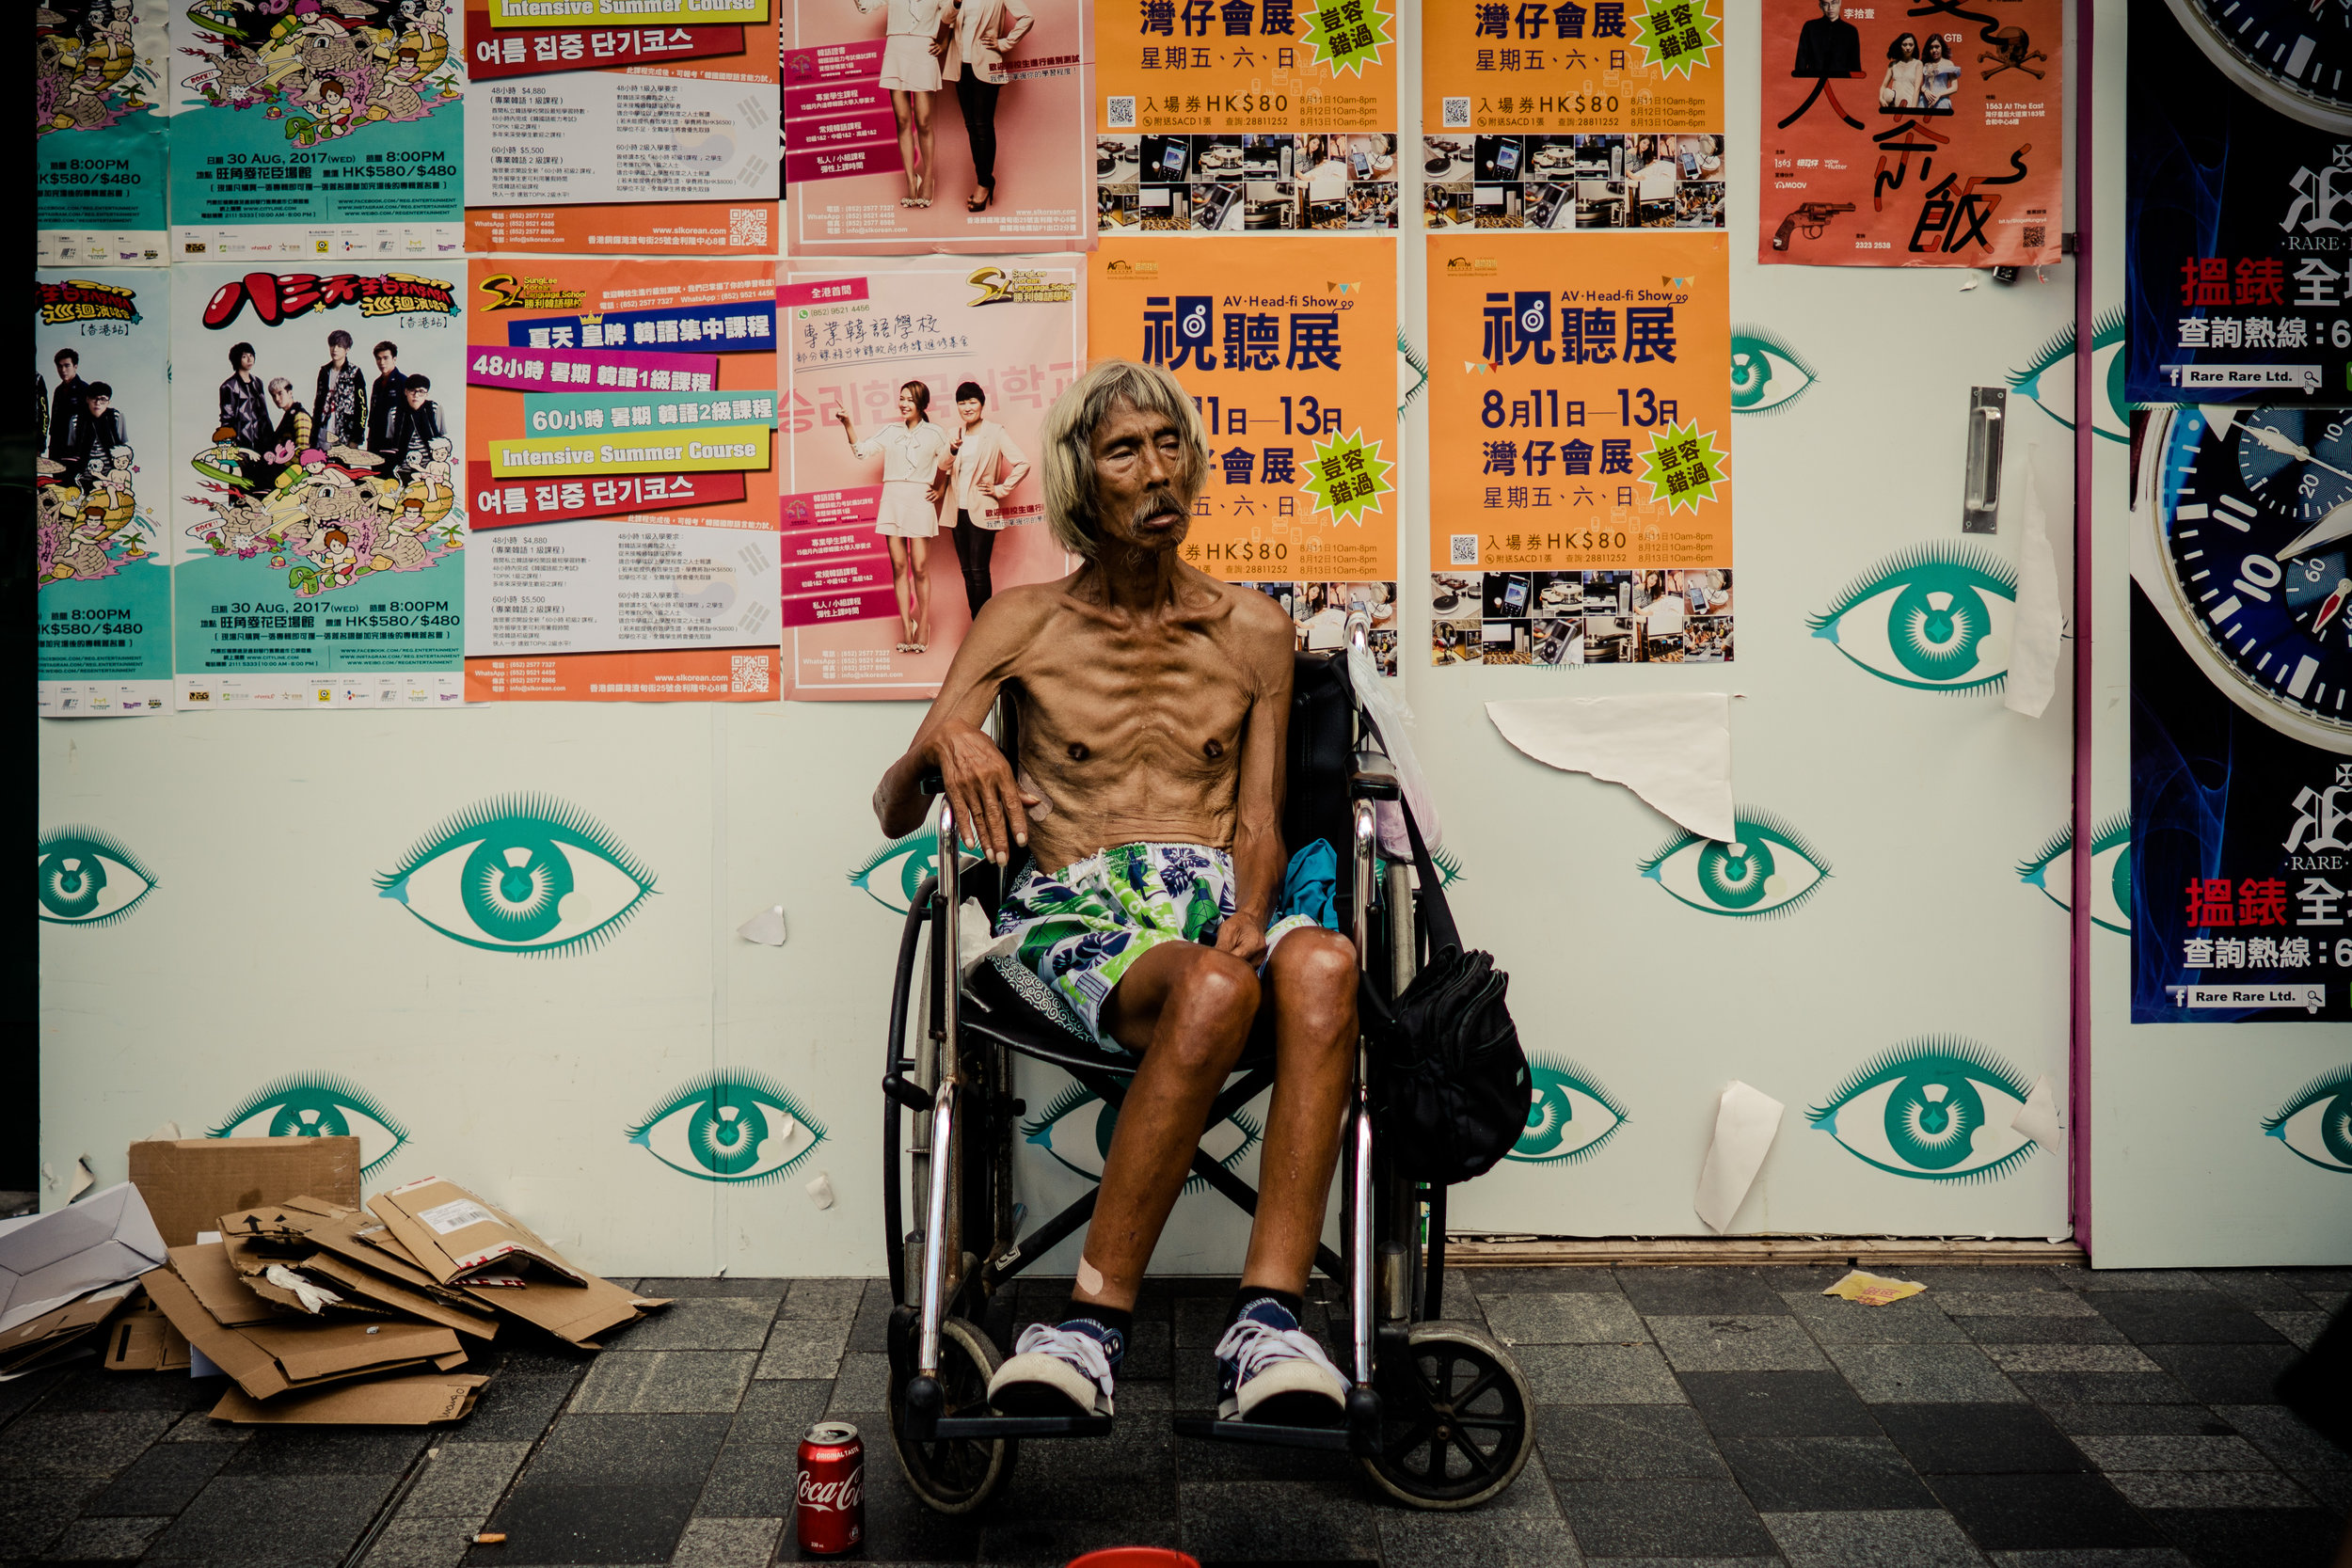 Jordan, HK